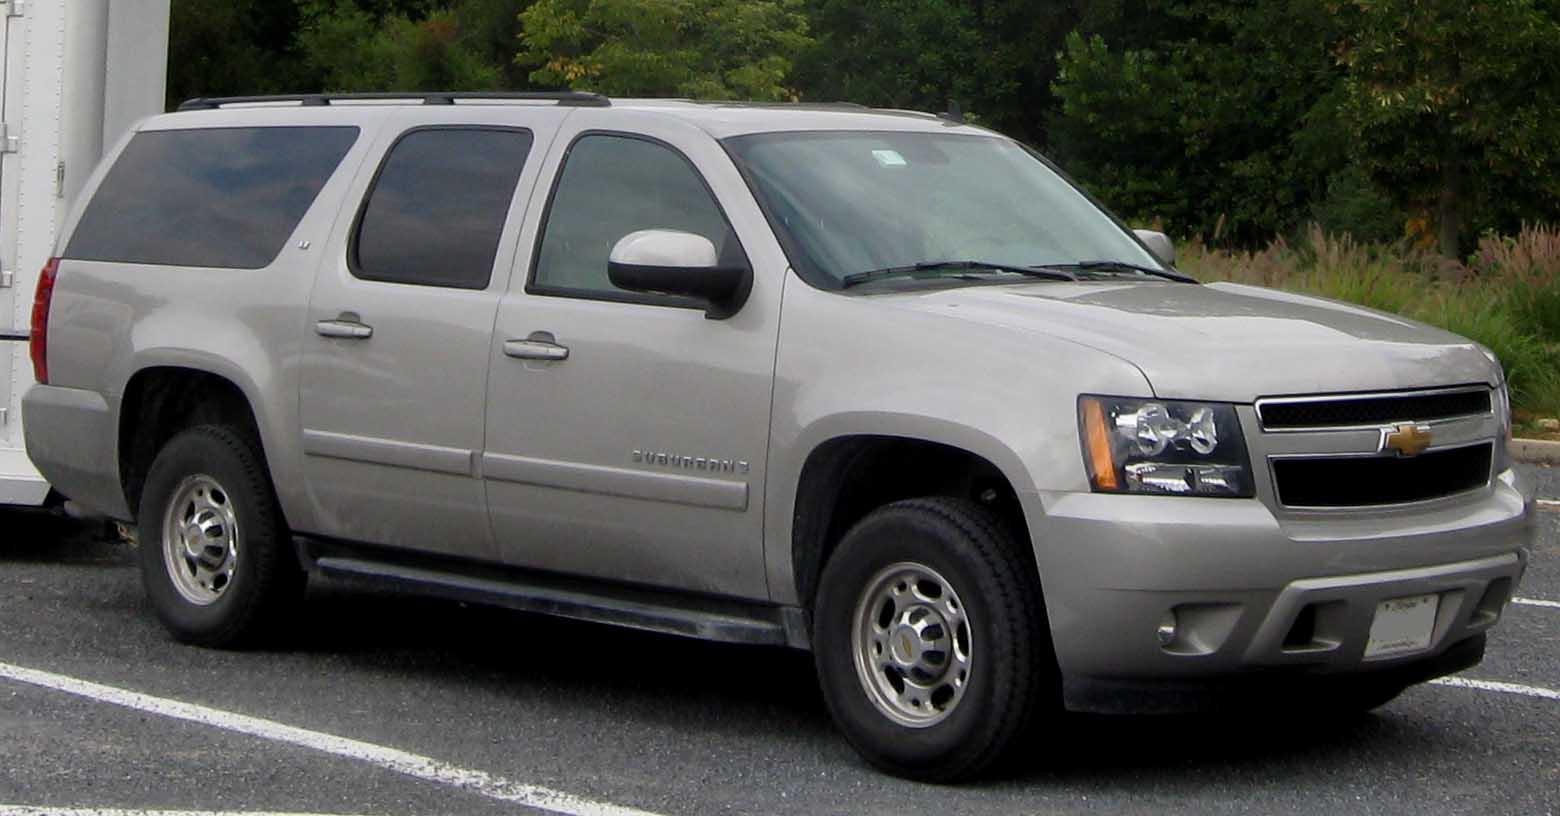 Chevrolet Suburban 2005 foto - 1